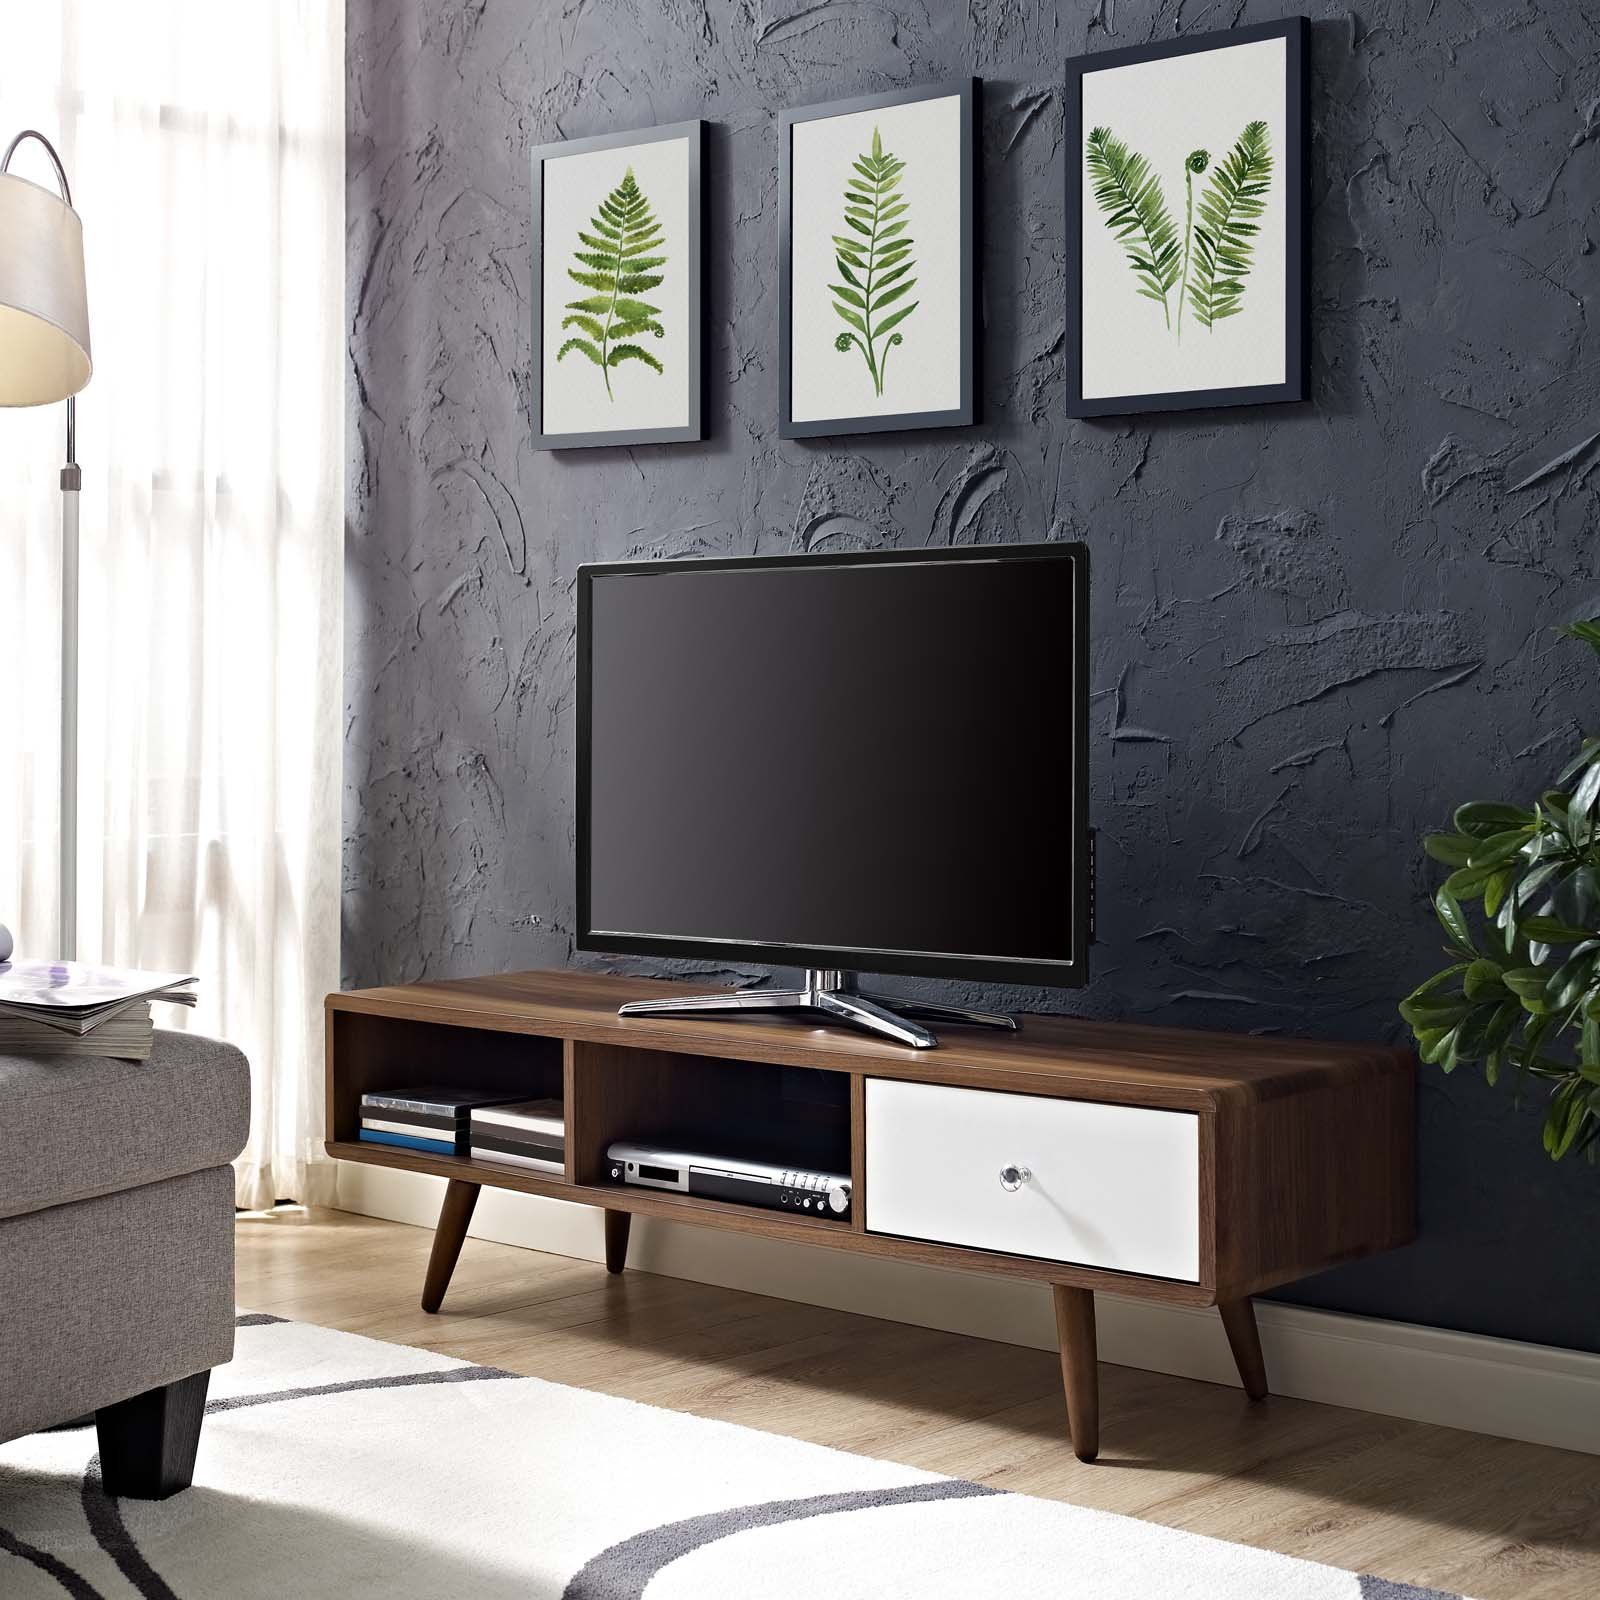 Modway Transmit Mid Century Modern Low Profile 55 Inch TV Stand In Walnut